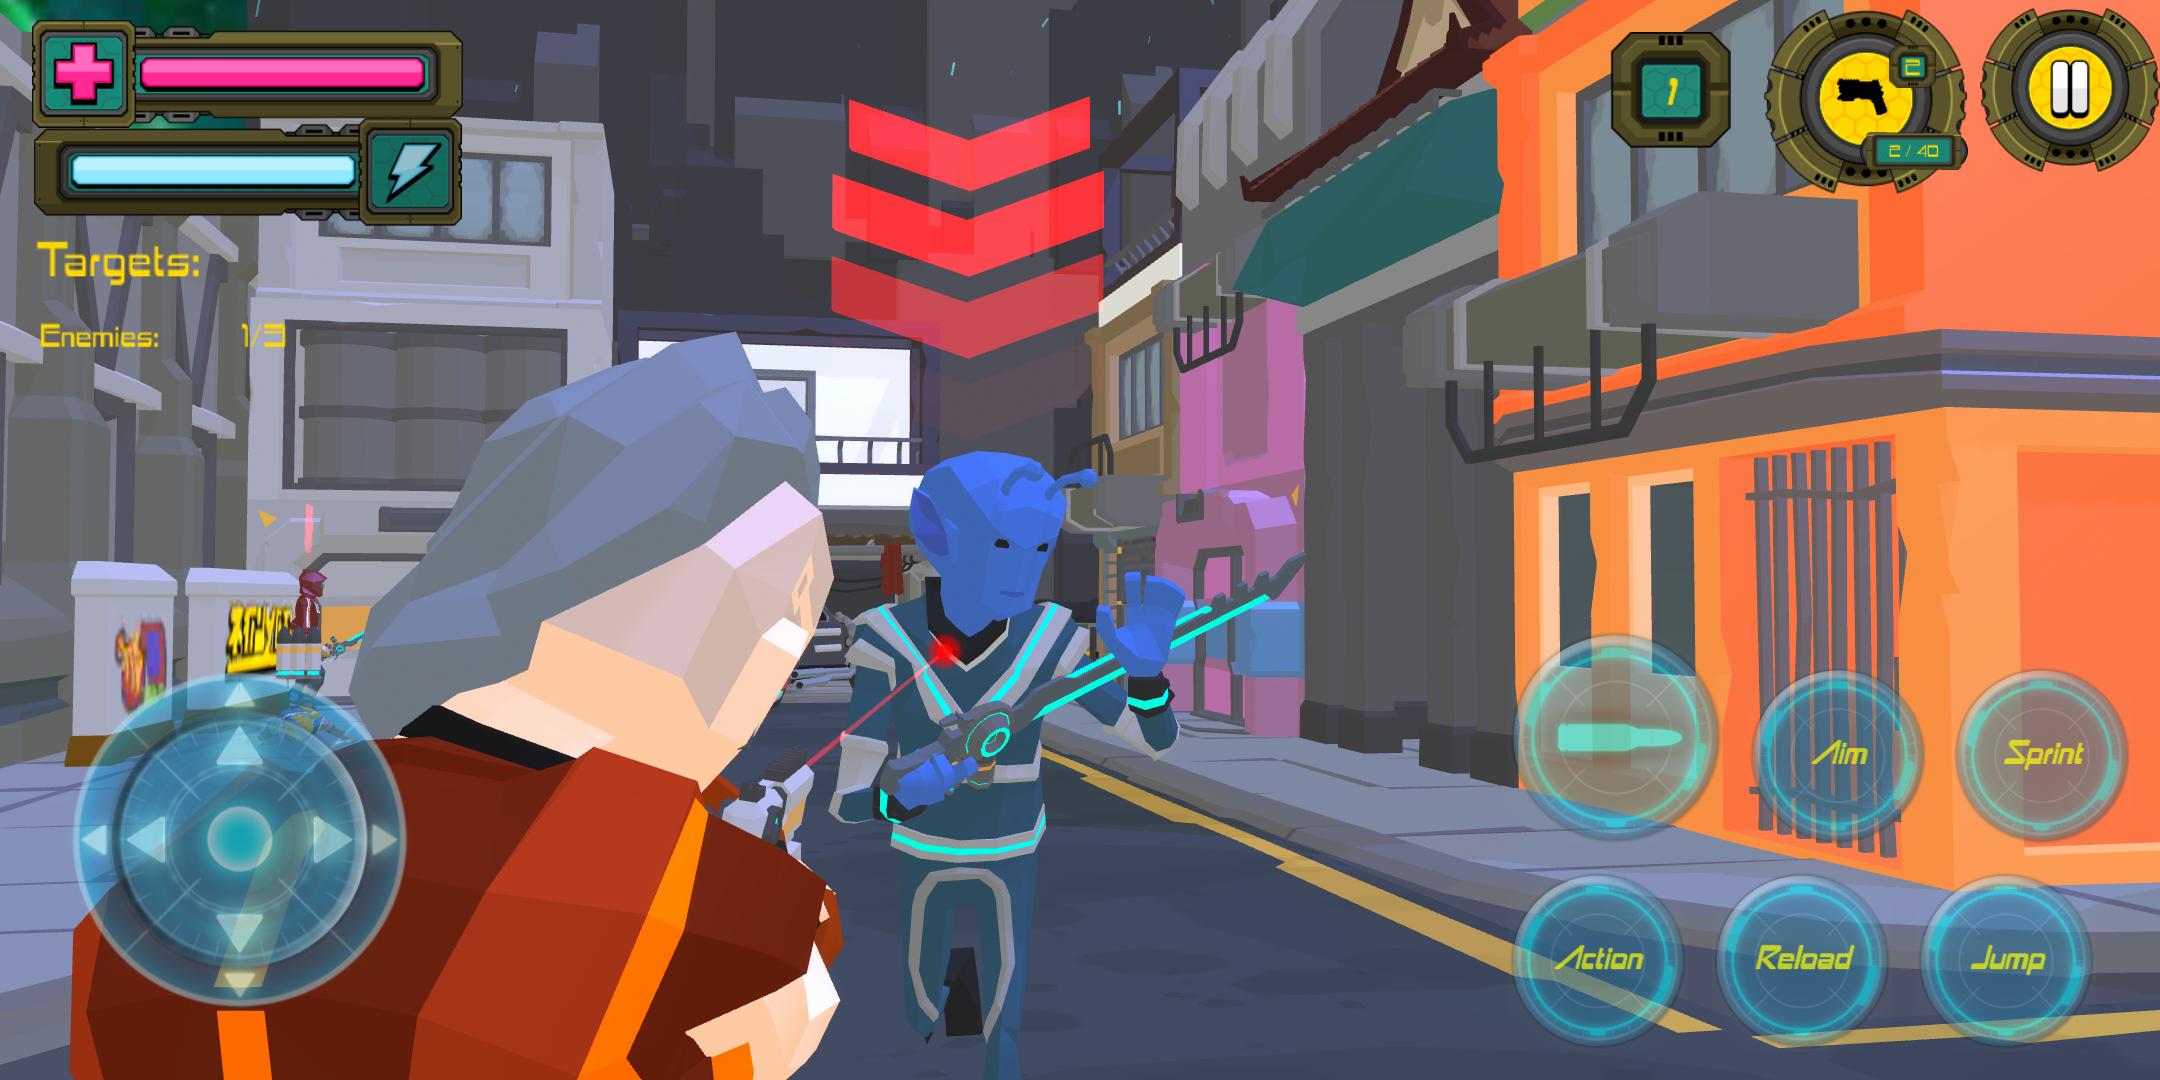 Polygon Cyber City 77: Crime Shooting Games 2021